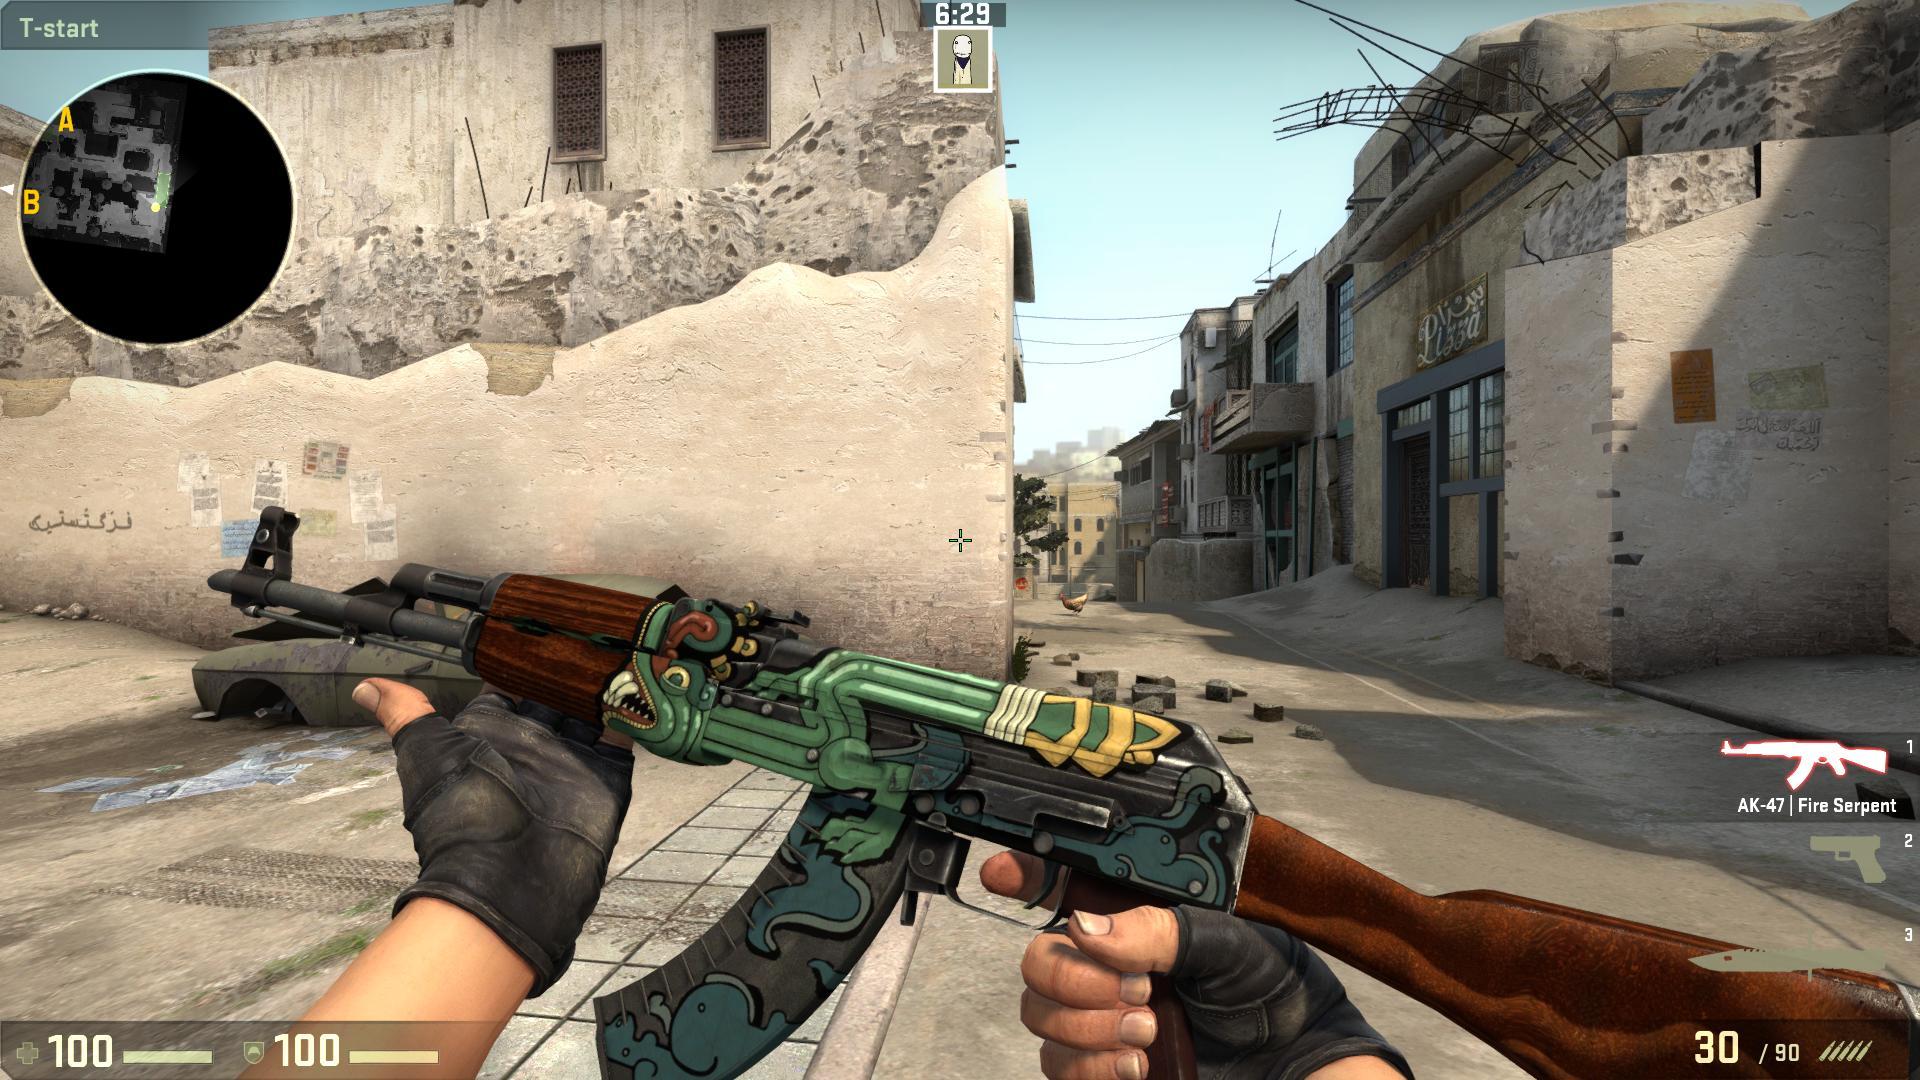 Top 10 CSGO Best AK-47 Skins | GAMERS DECIDE